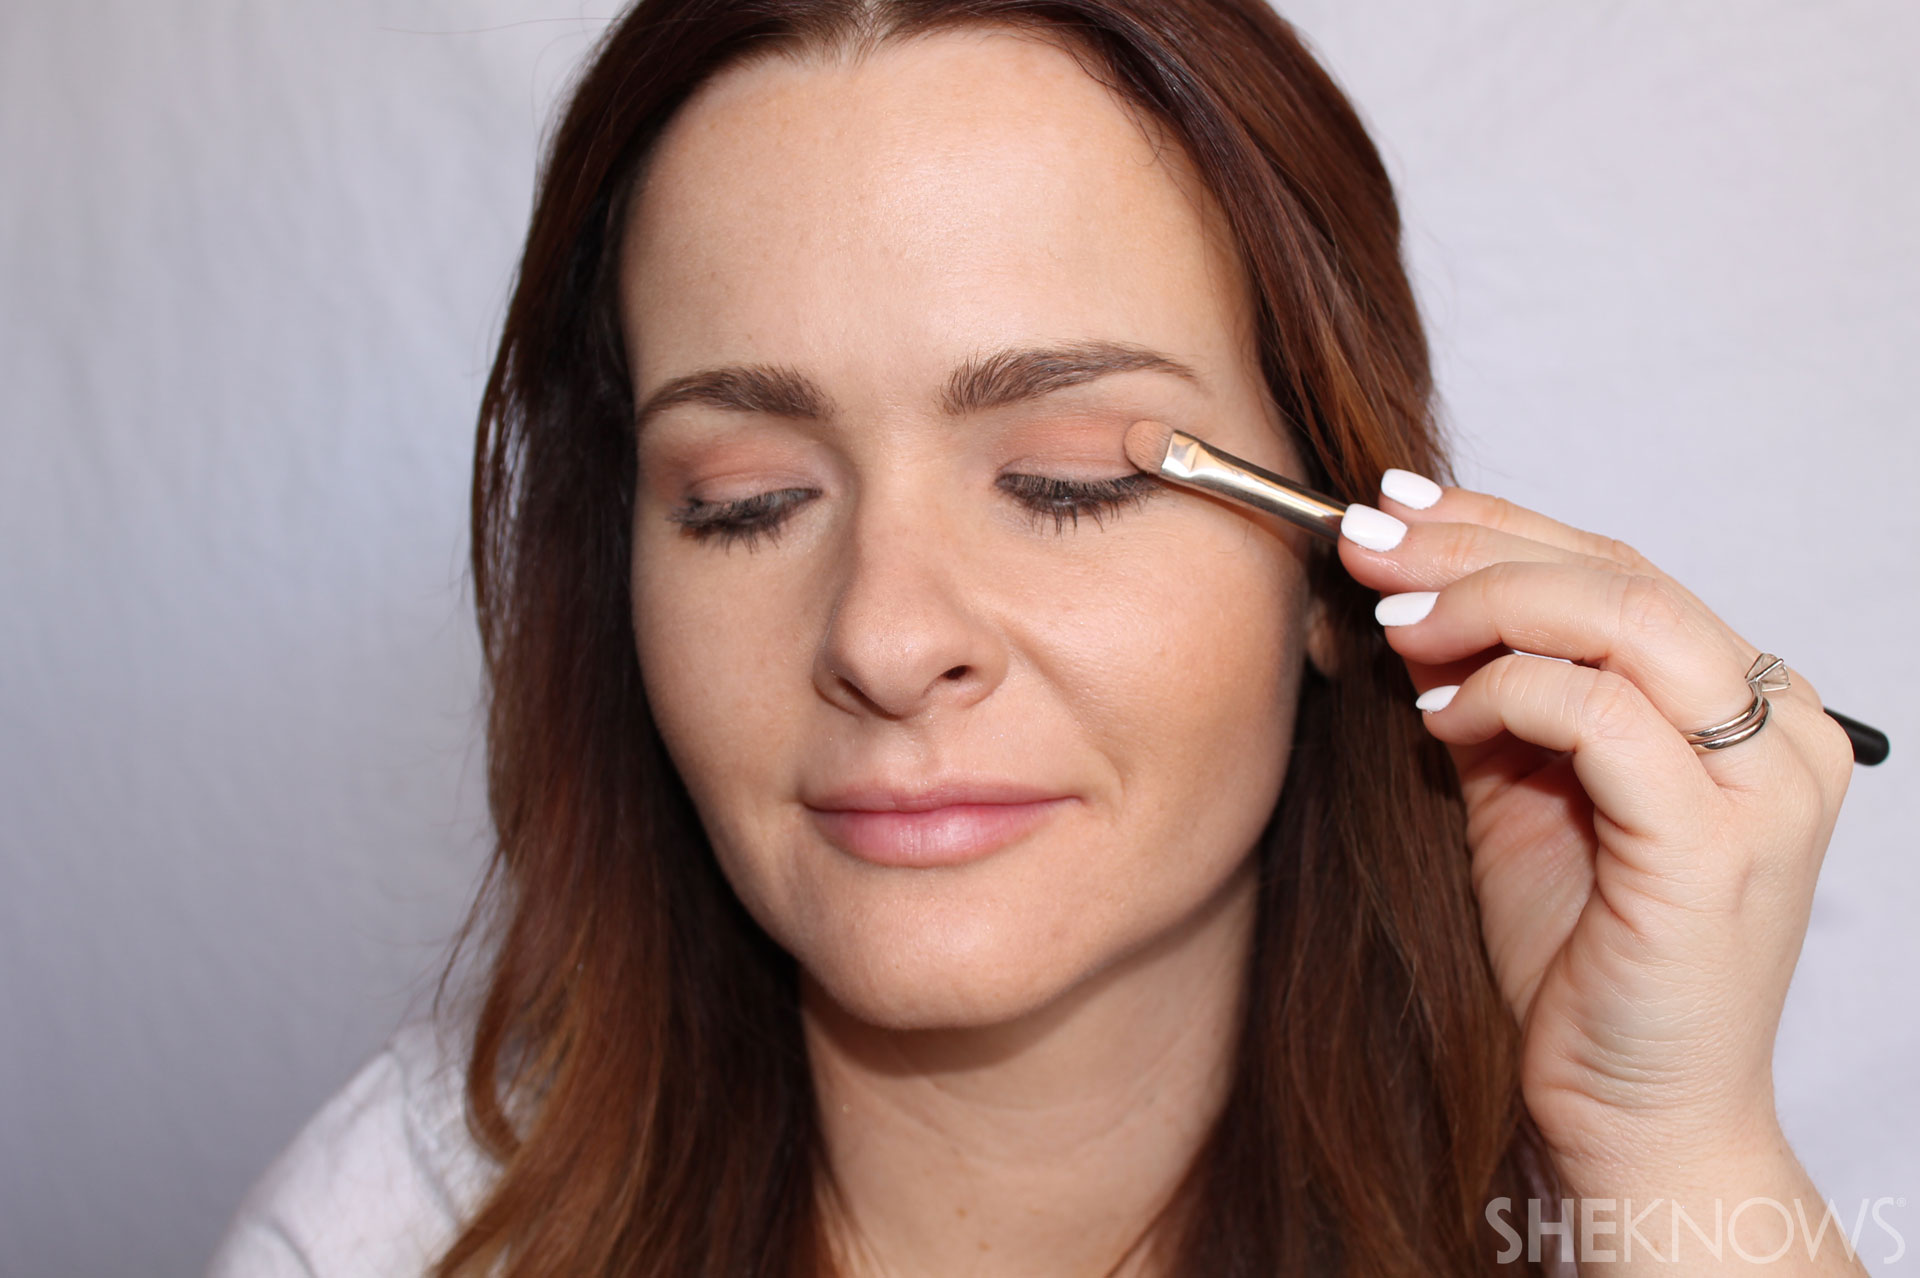 DIY Extreme cateye and bold lips: use soft eyeshadow